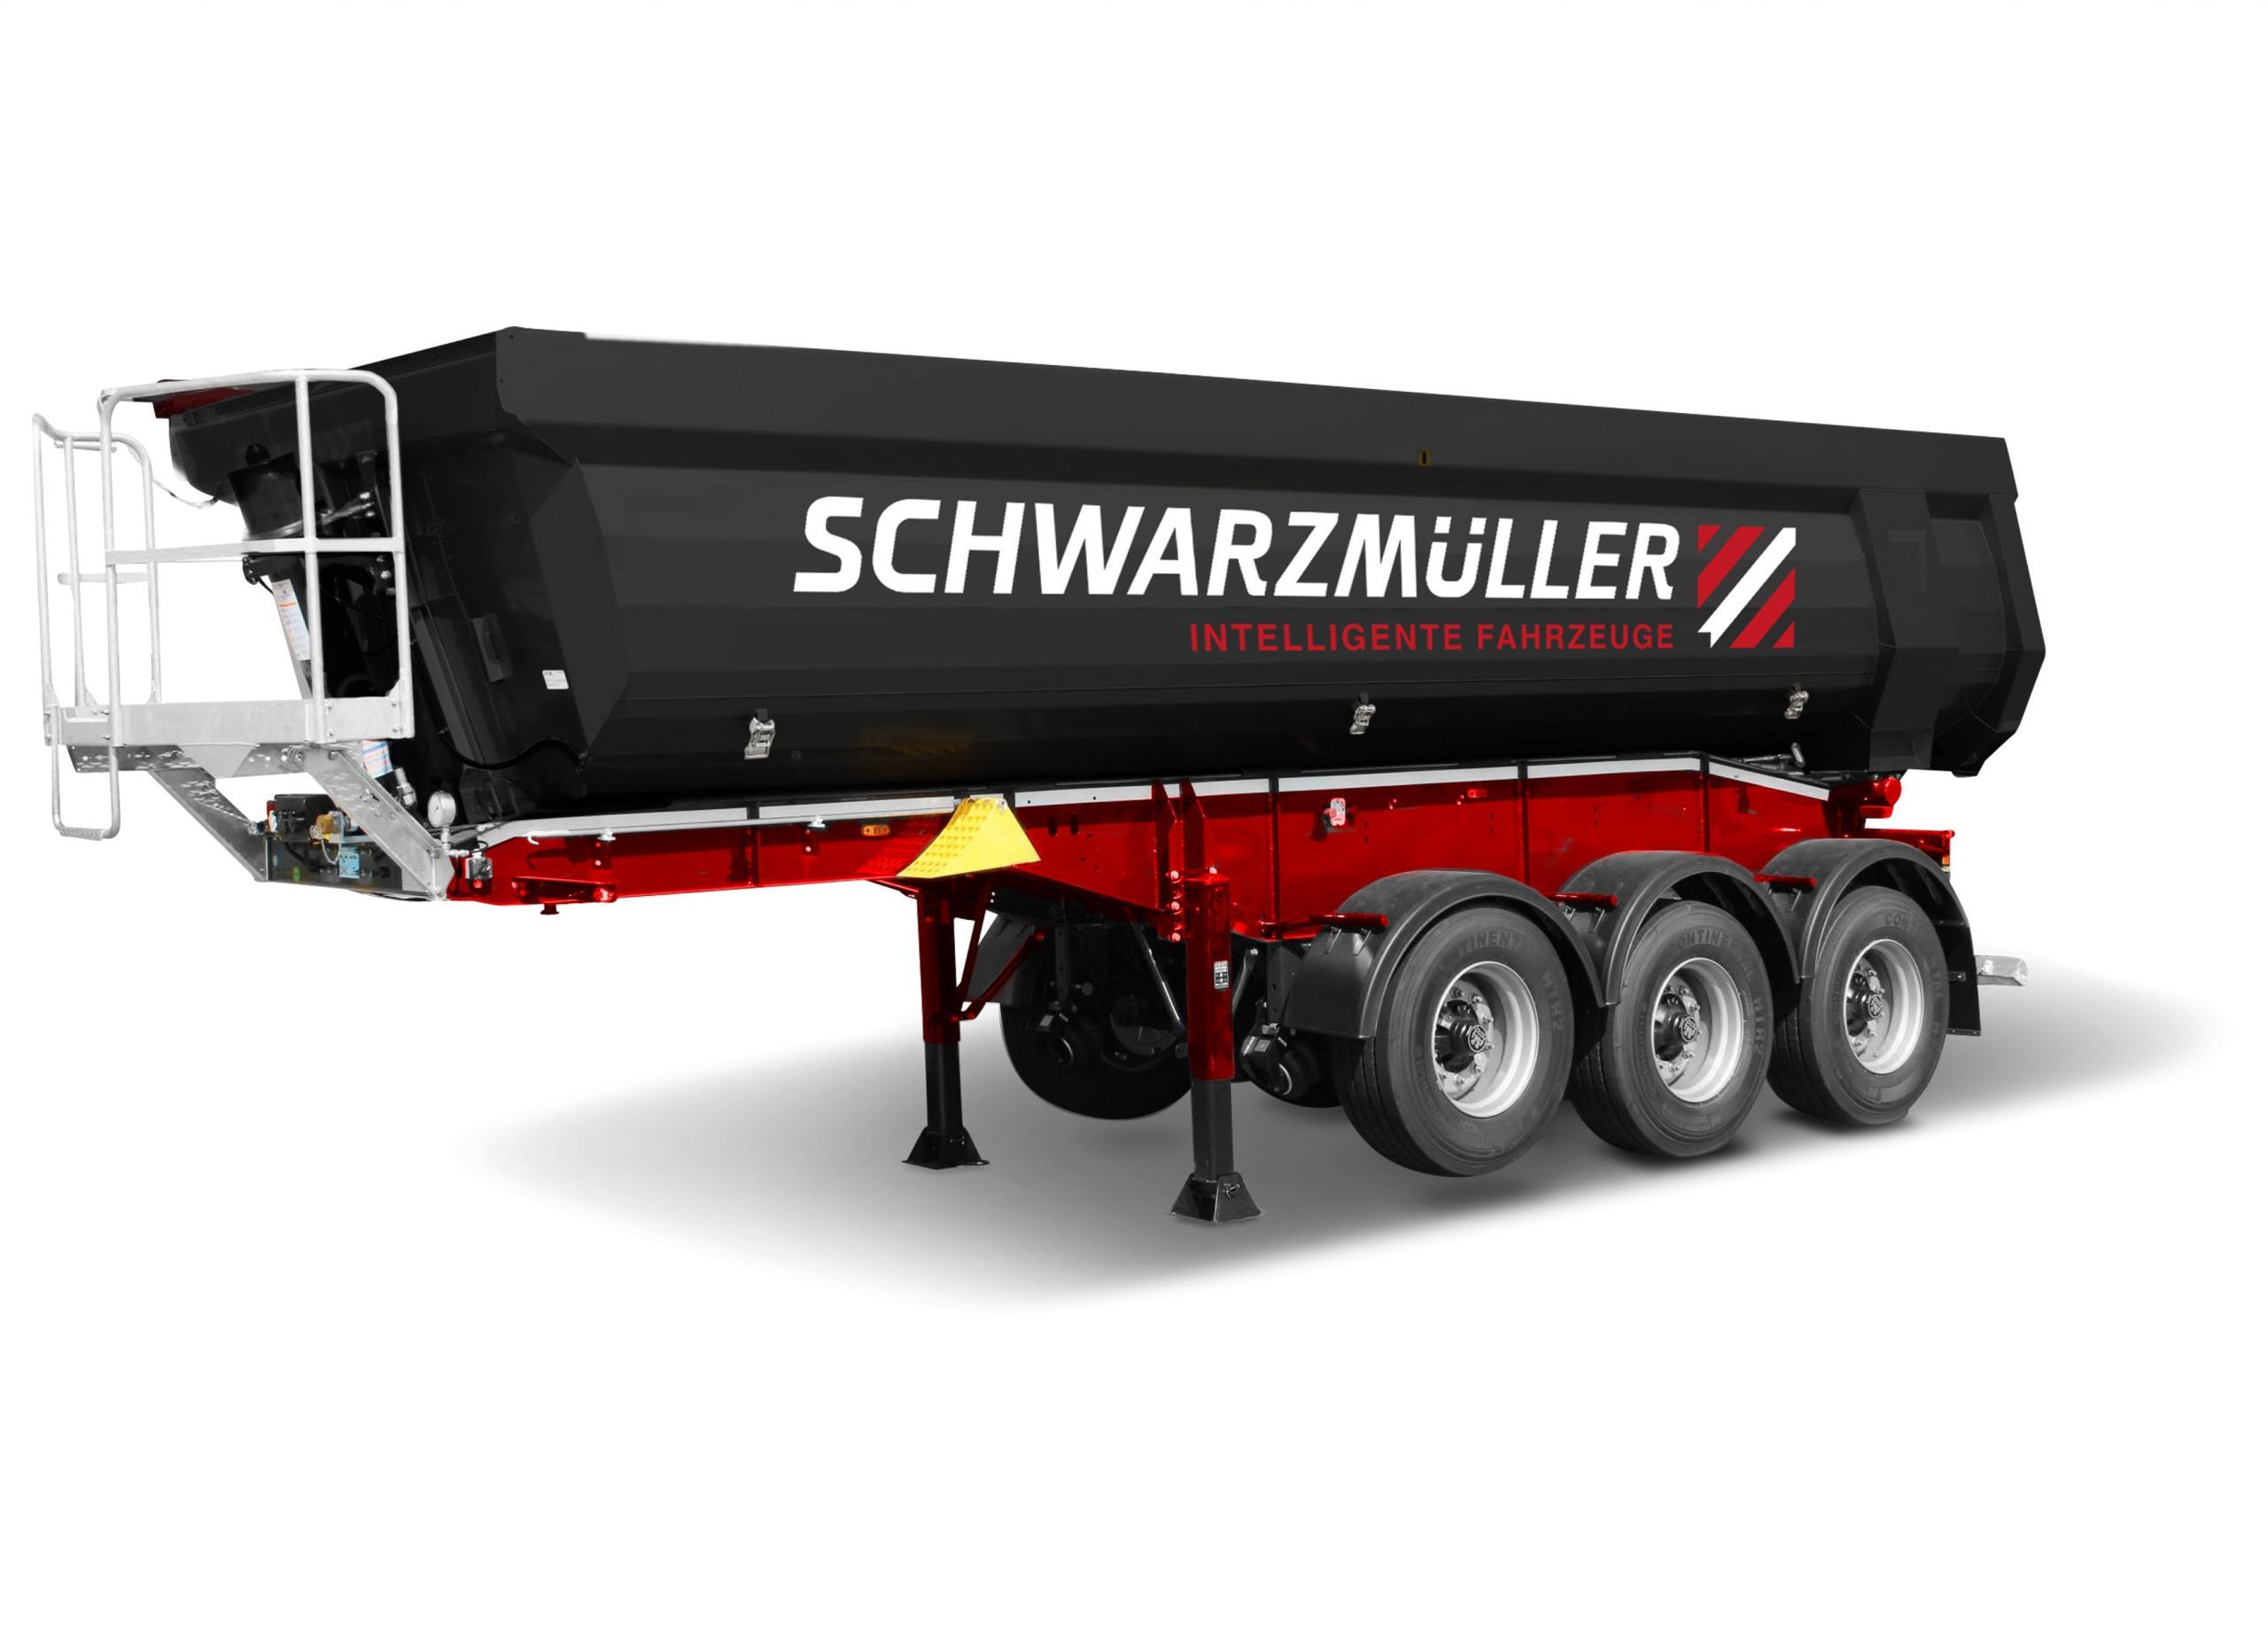 Schwarzmüller